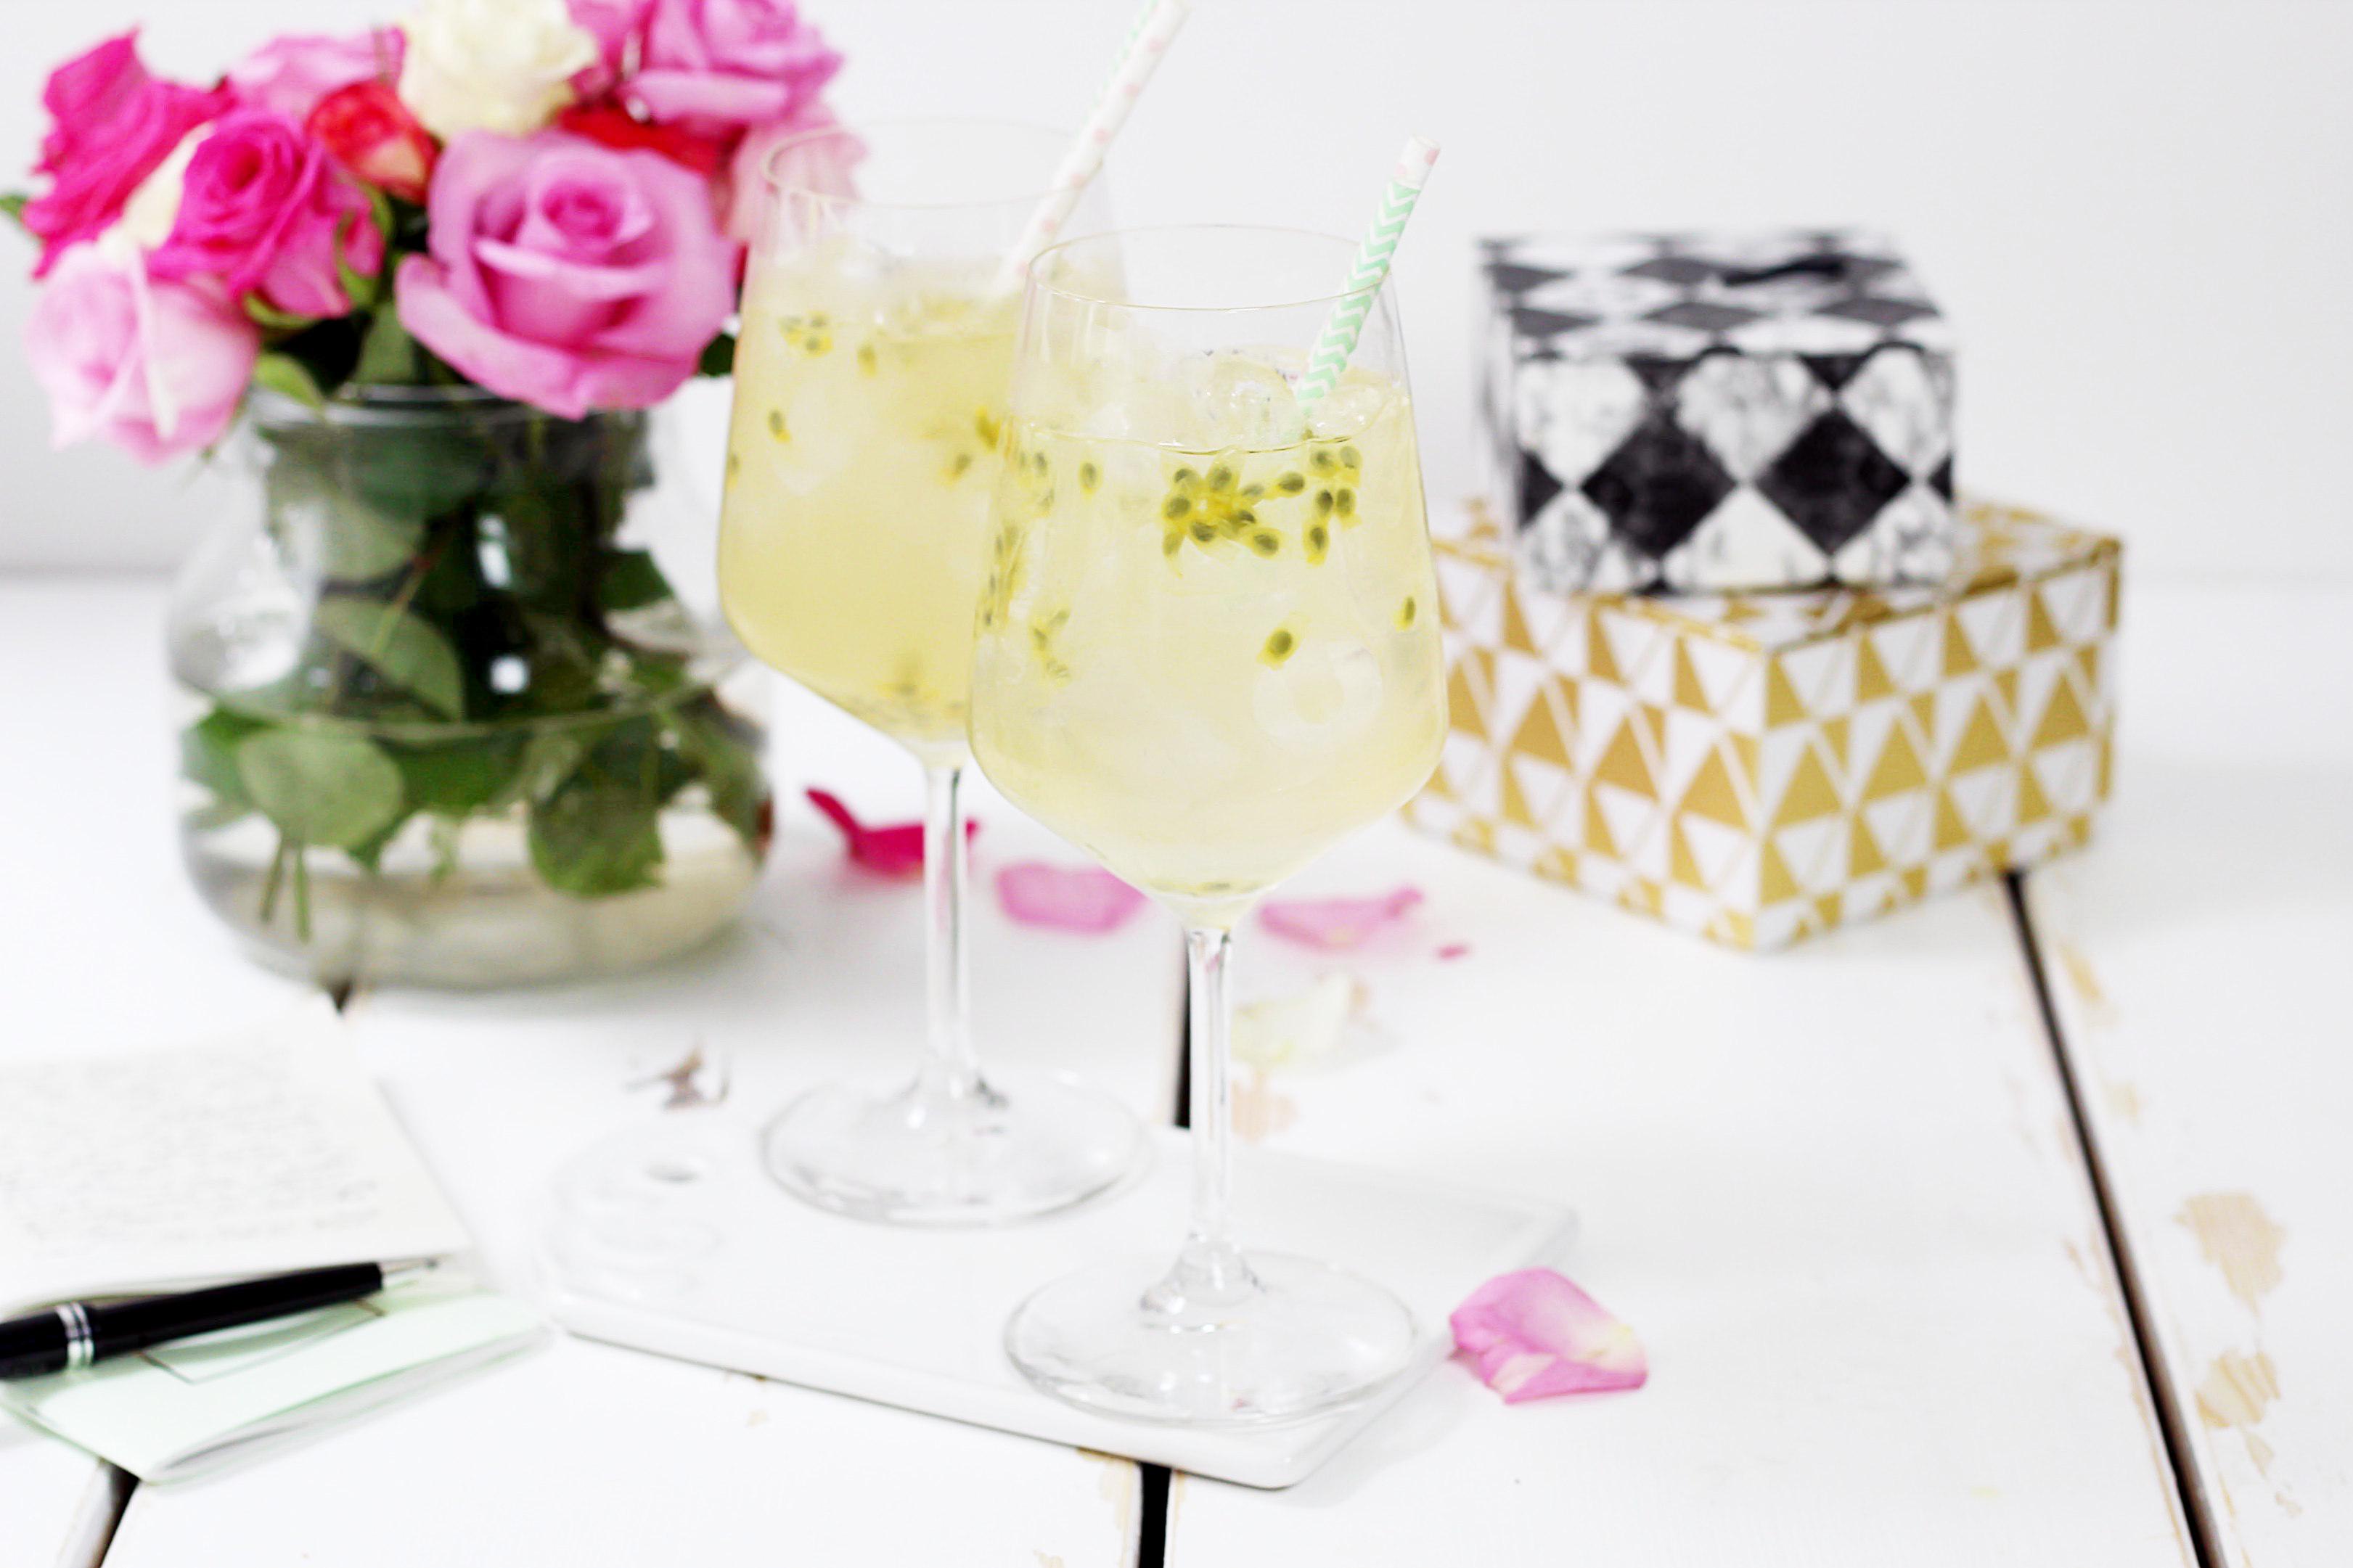 Rezepte-Sommer-Drinks-Lillet-Selbermachen-DIY-Blog